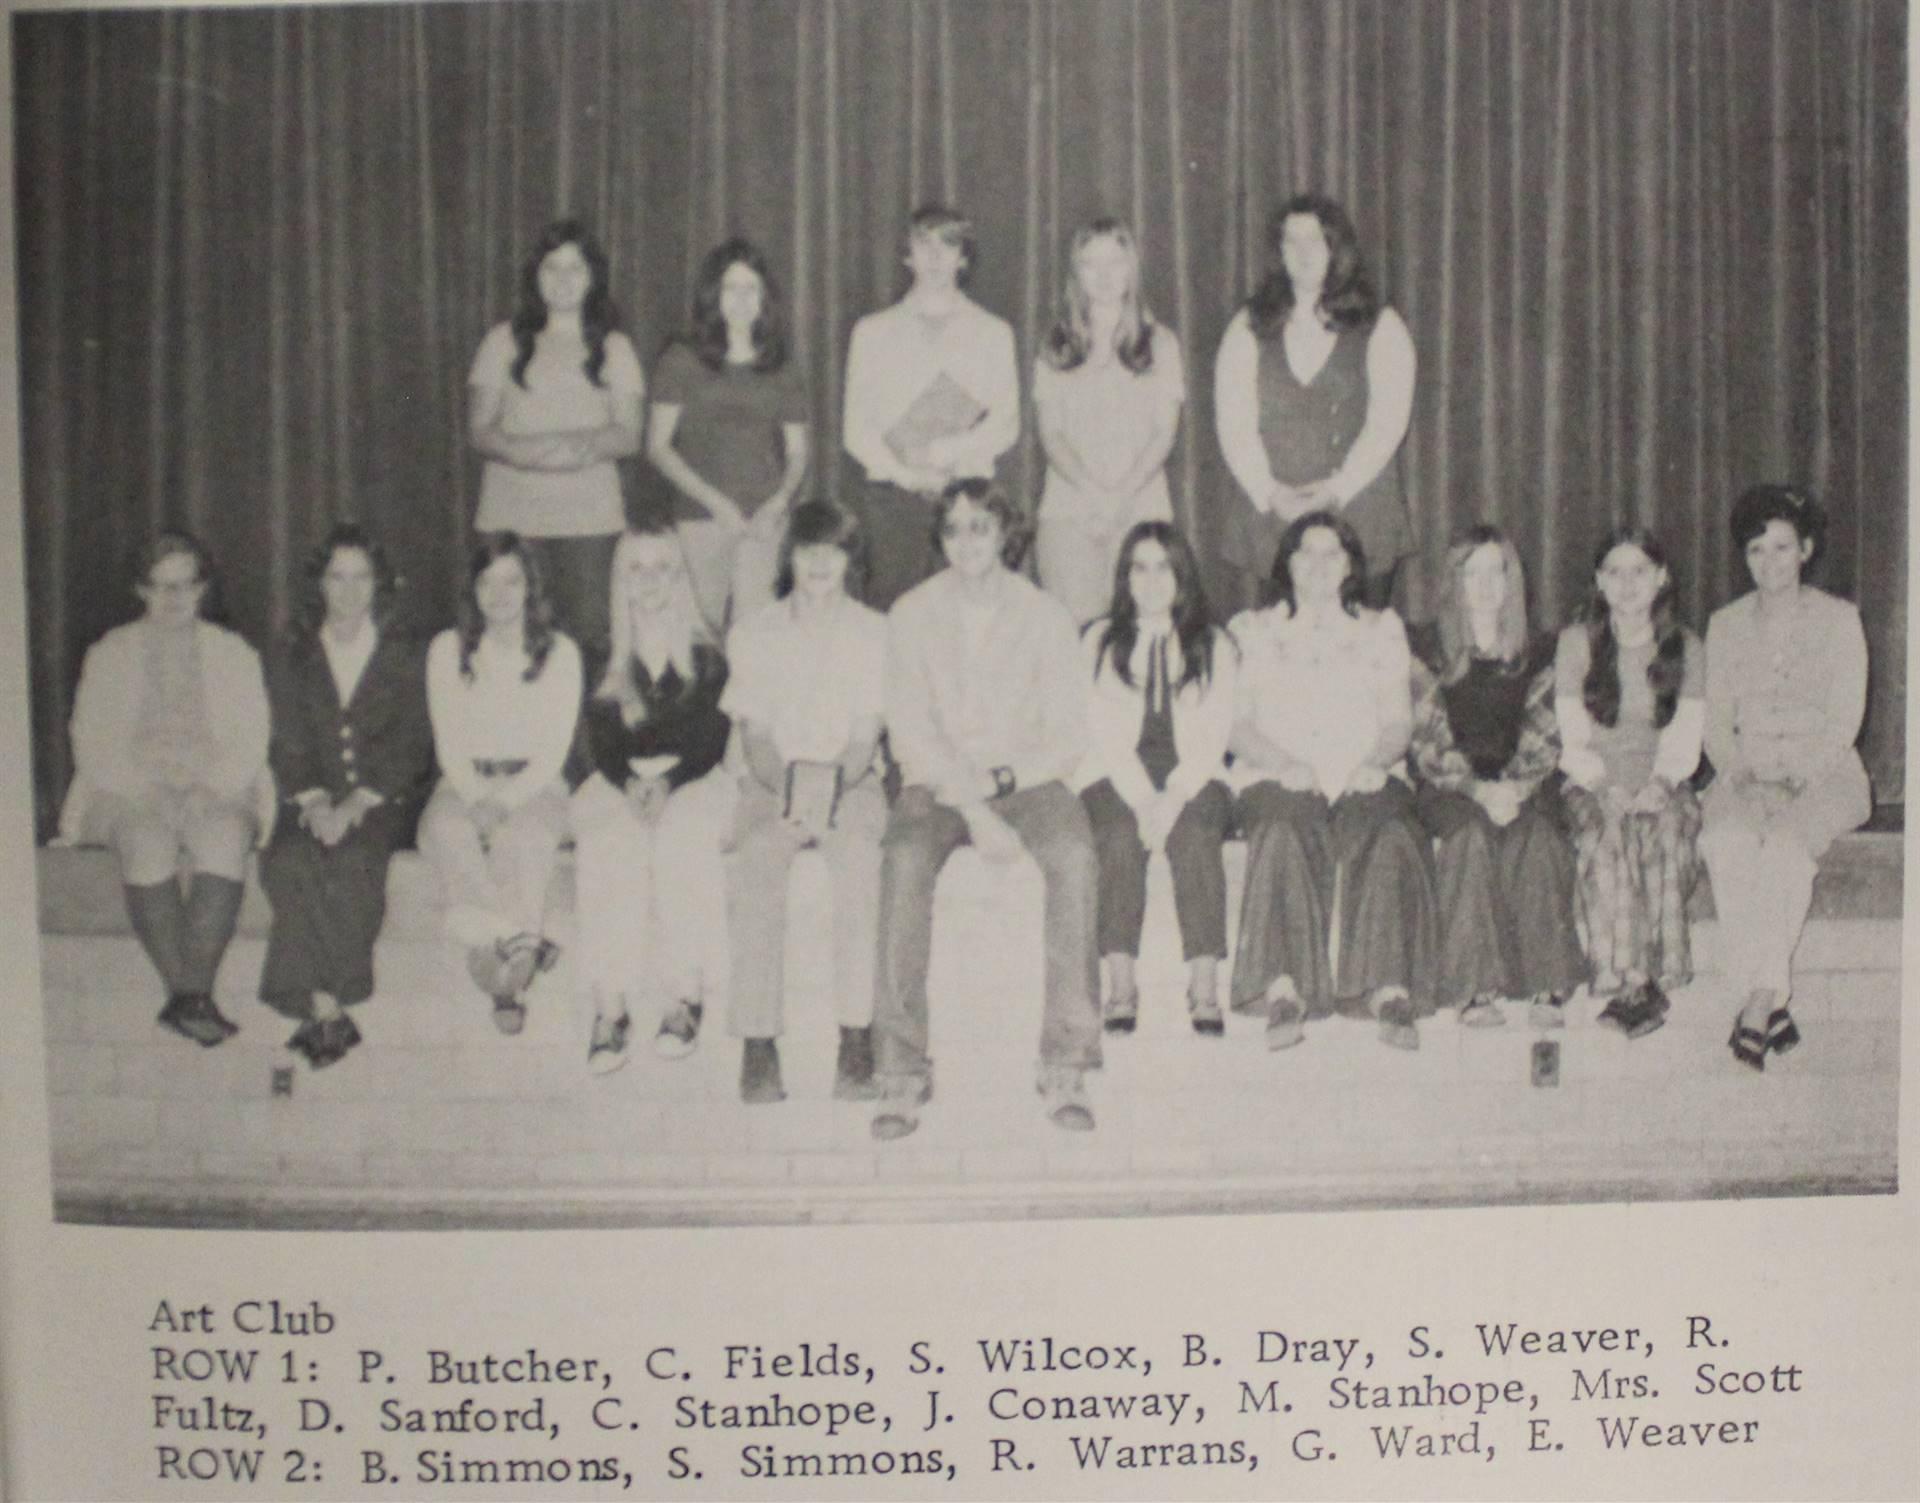 1973 Art Club